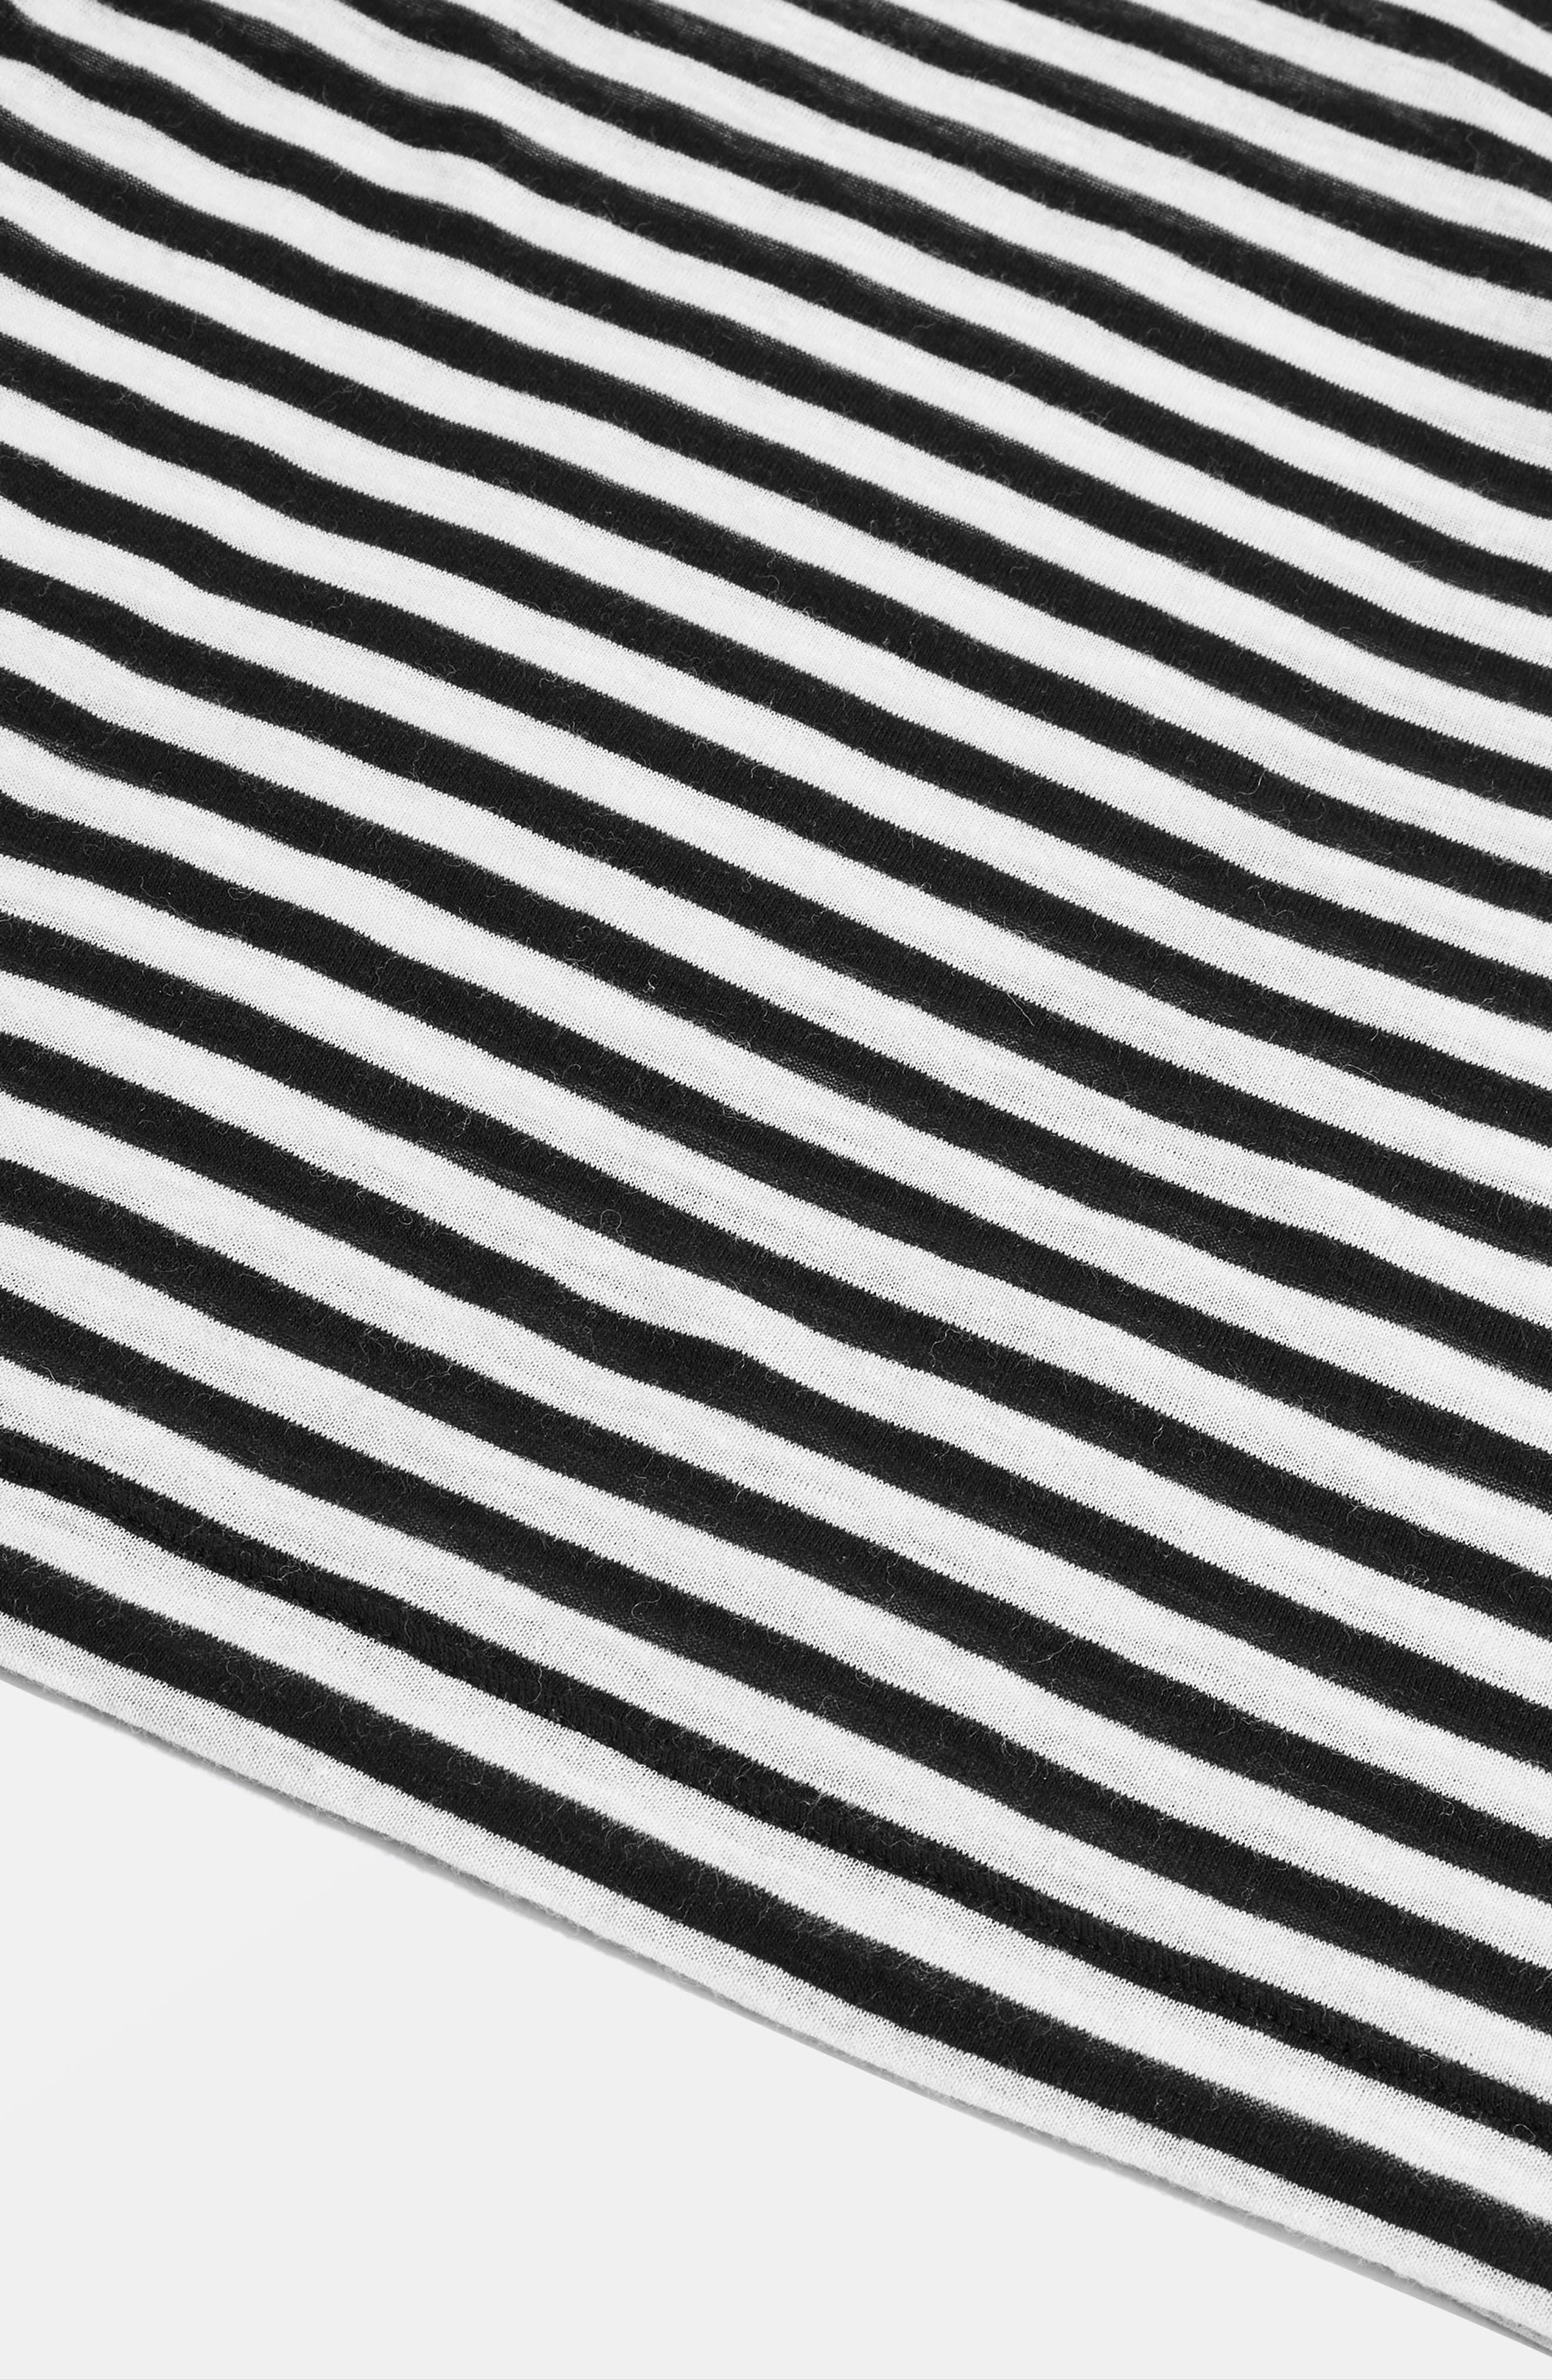 Topshop Stripe Slub Shirt,                             Main thumbnail 1, color,                             001